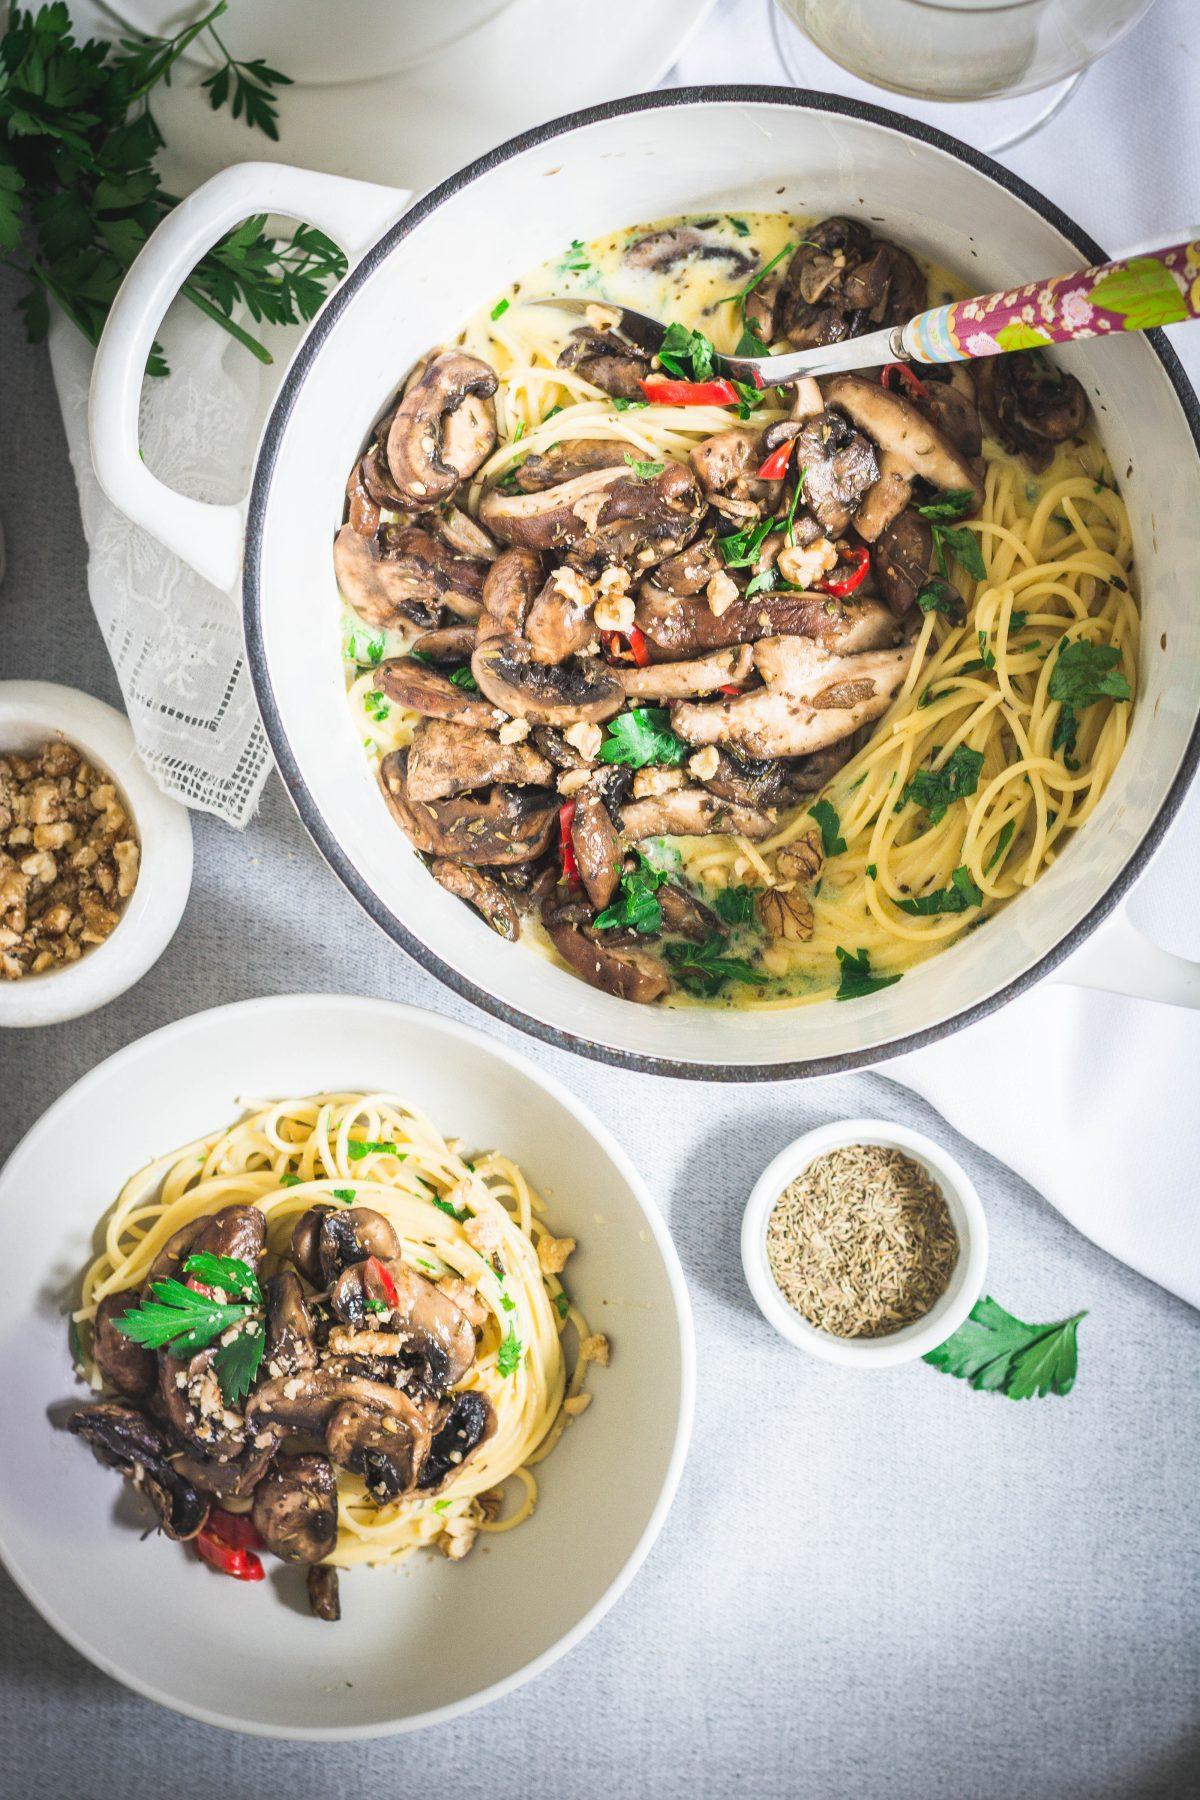 Spaghetti, Mascarpone Sauce, Mushrooms - thespiceadventuress.com